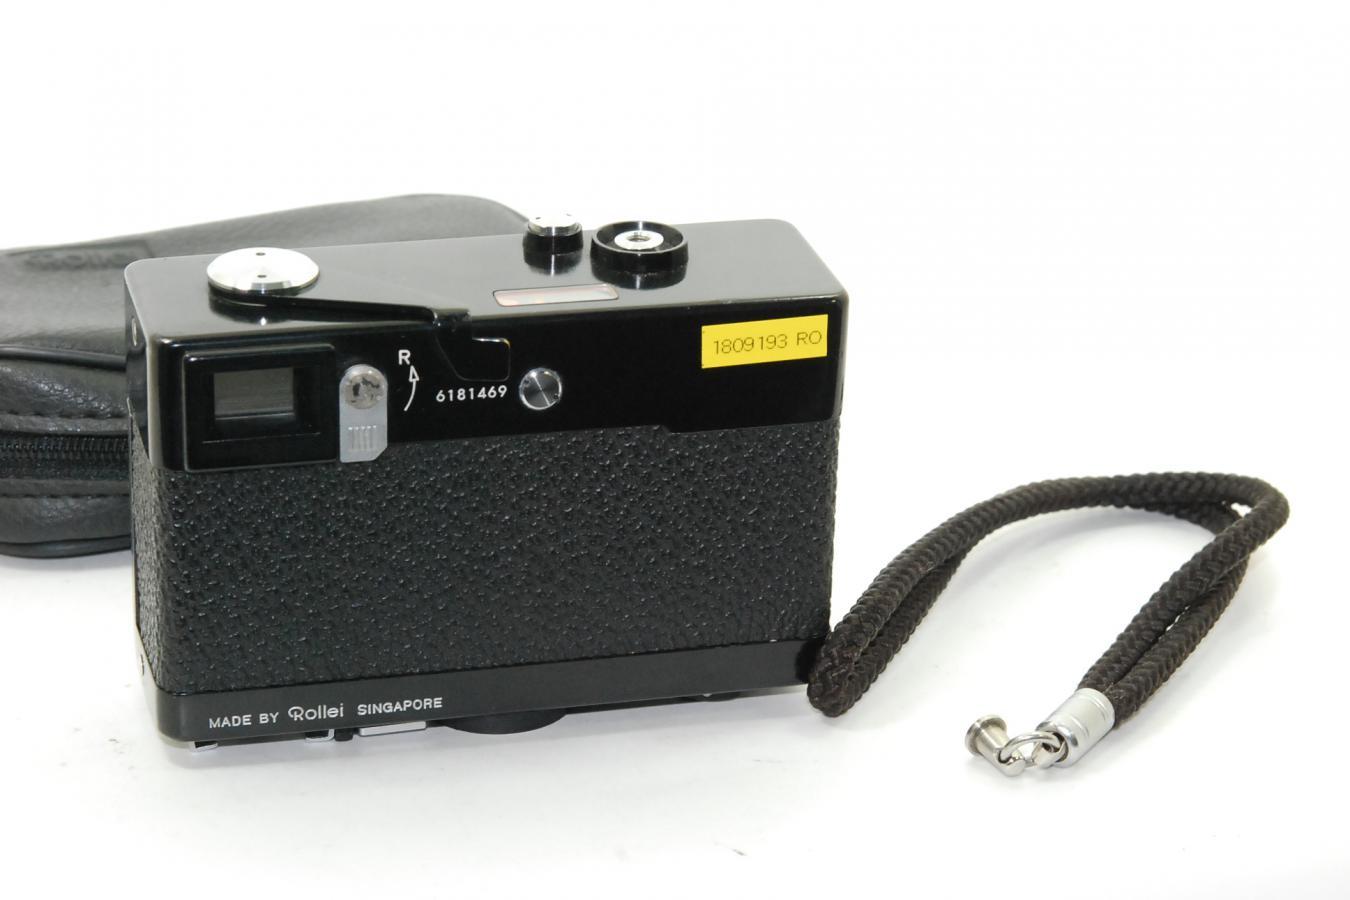 Rollei 35 ブラック 純正ケース、ストラップ付 【テッサー40/3.5レンズ搭載】